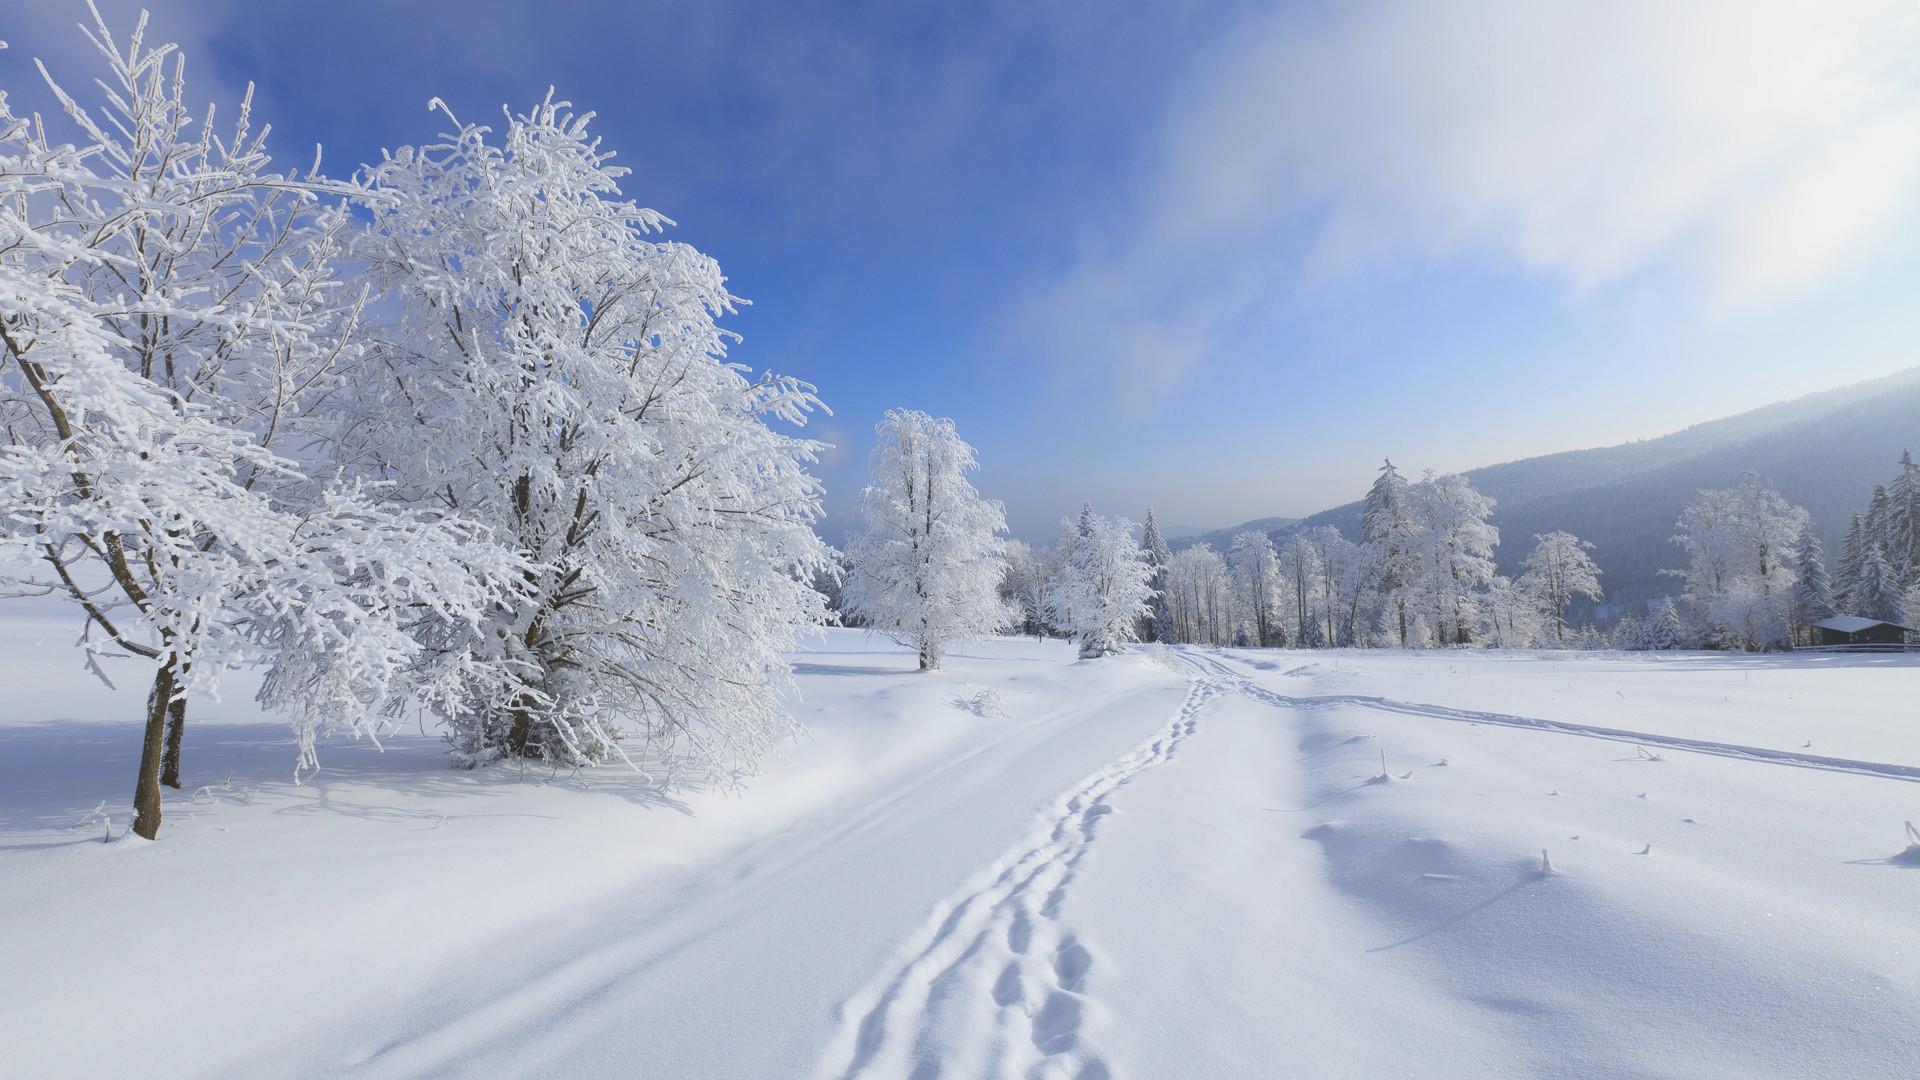 Res: 1920x1080, Snowfall Wallpaper Pict Best